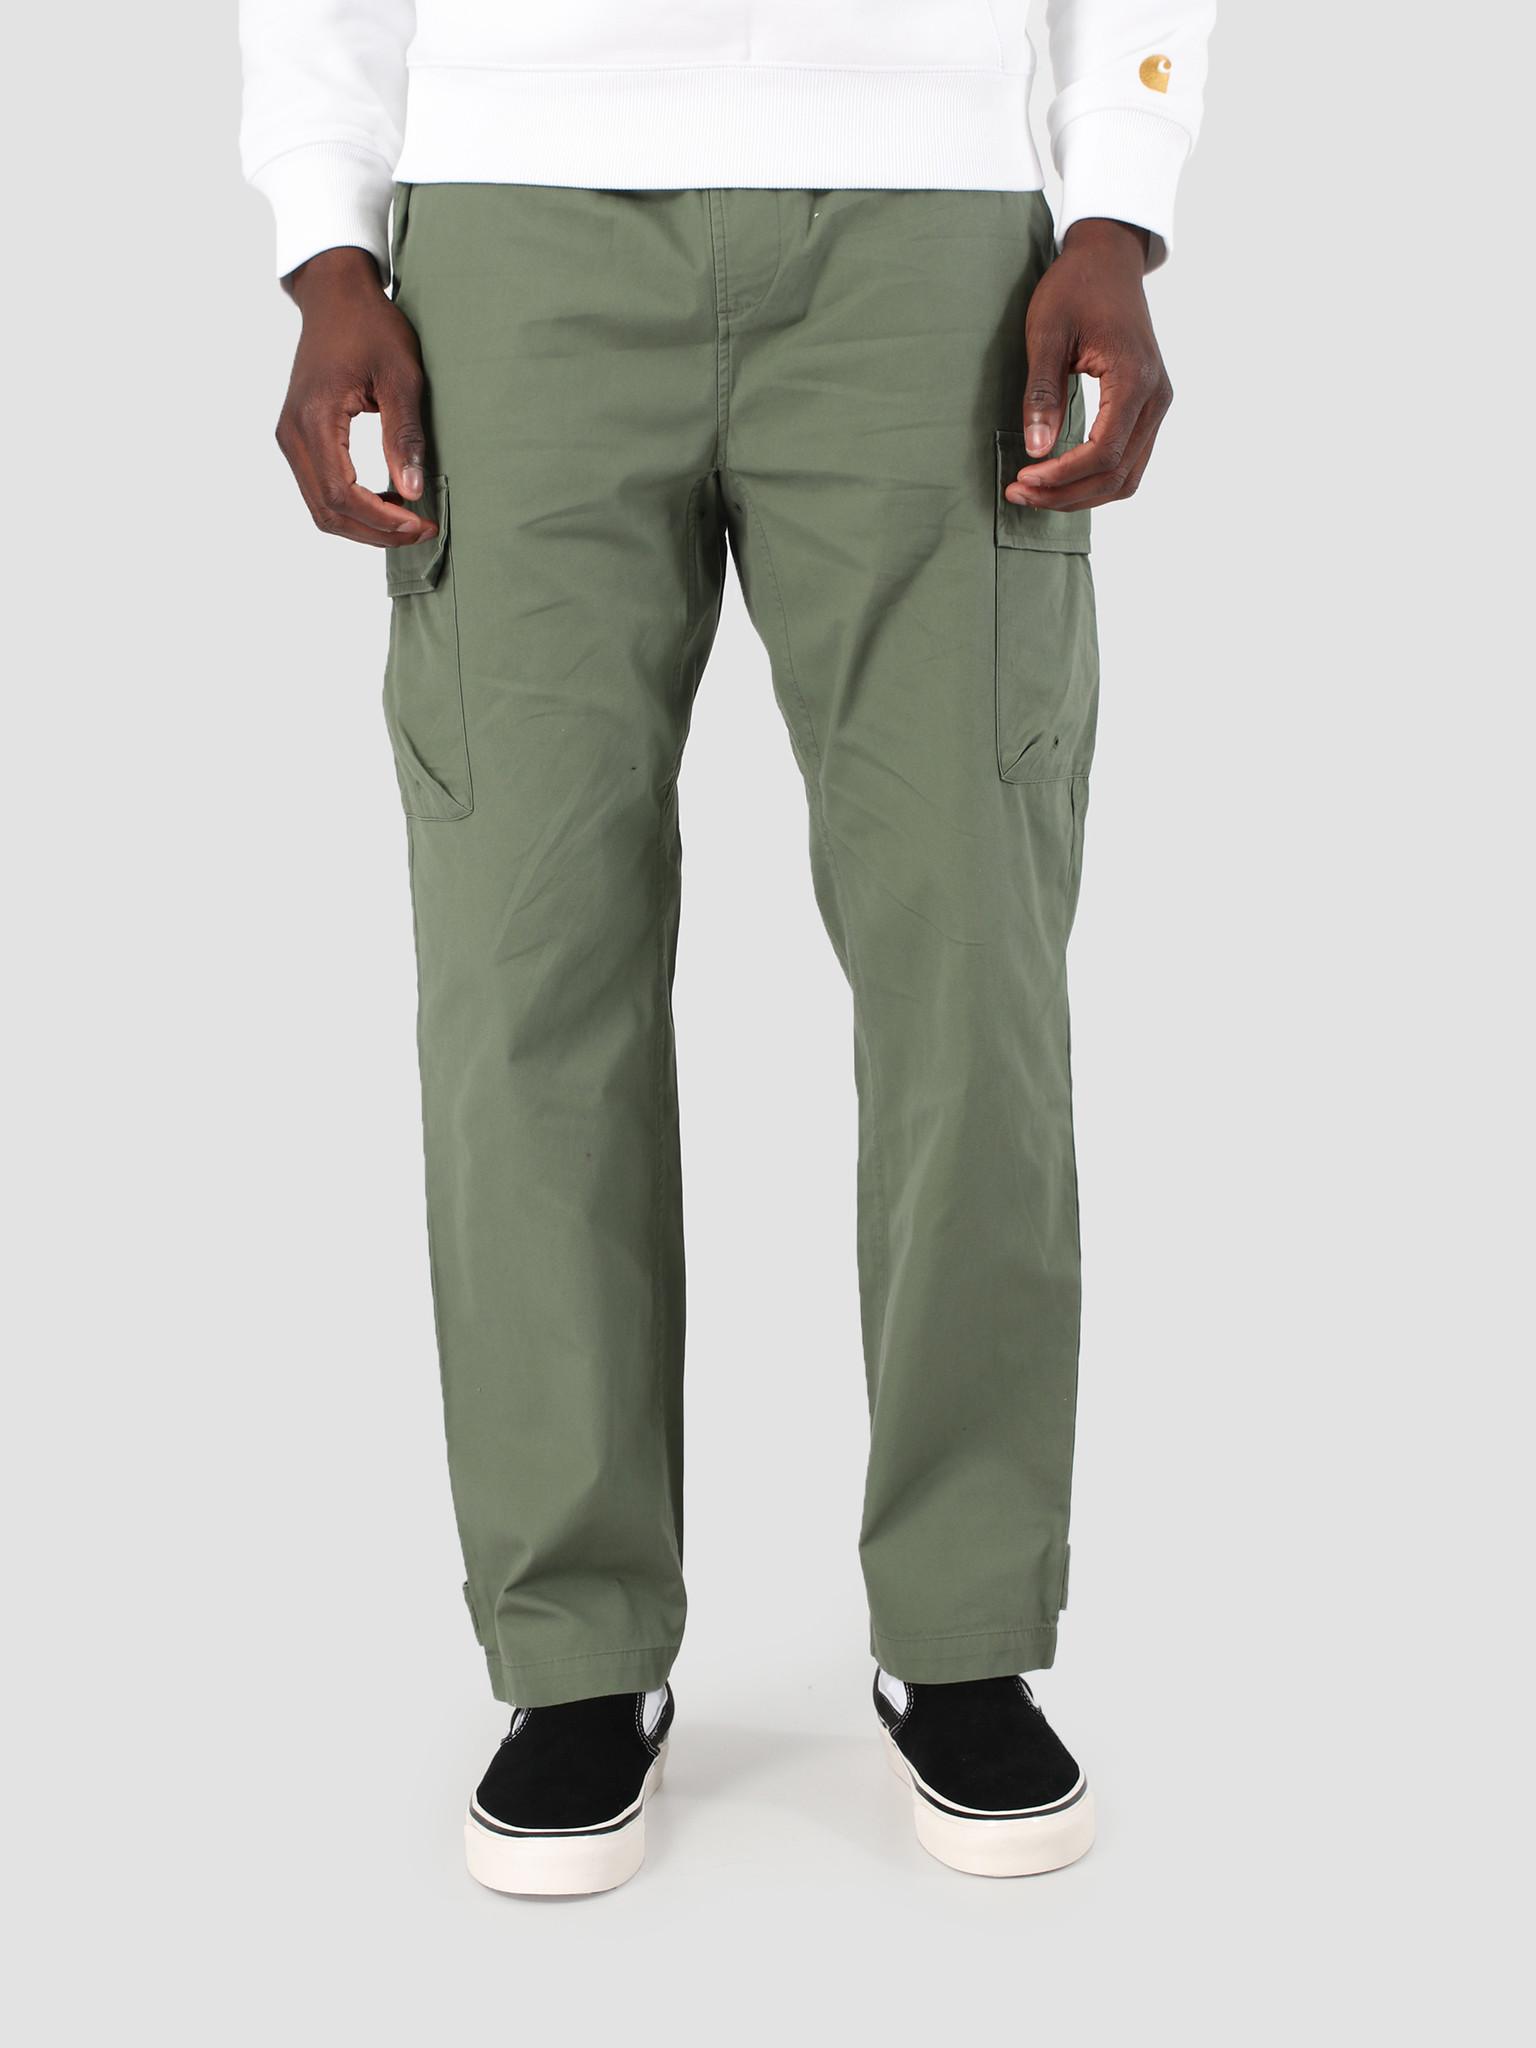 Carhartt WIP Carhartt WIP Laxford Pant Dollar Green I026154